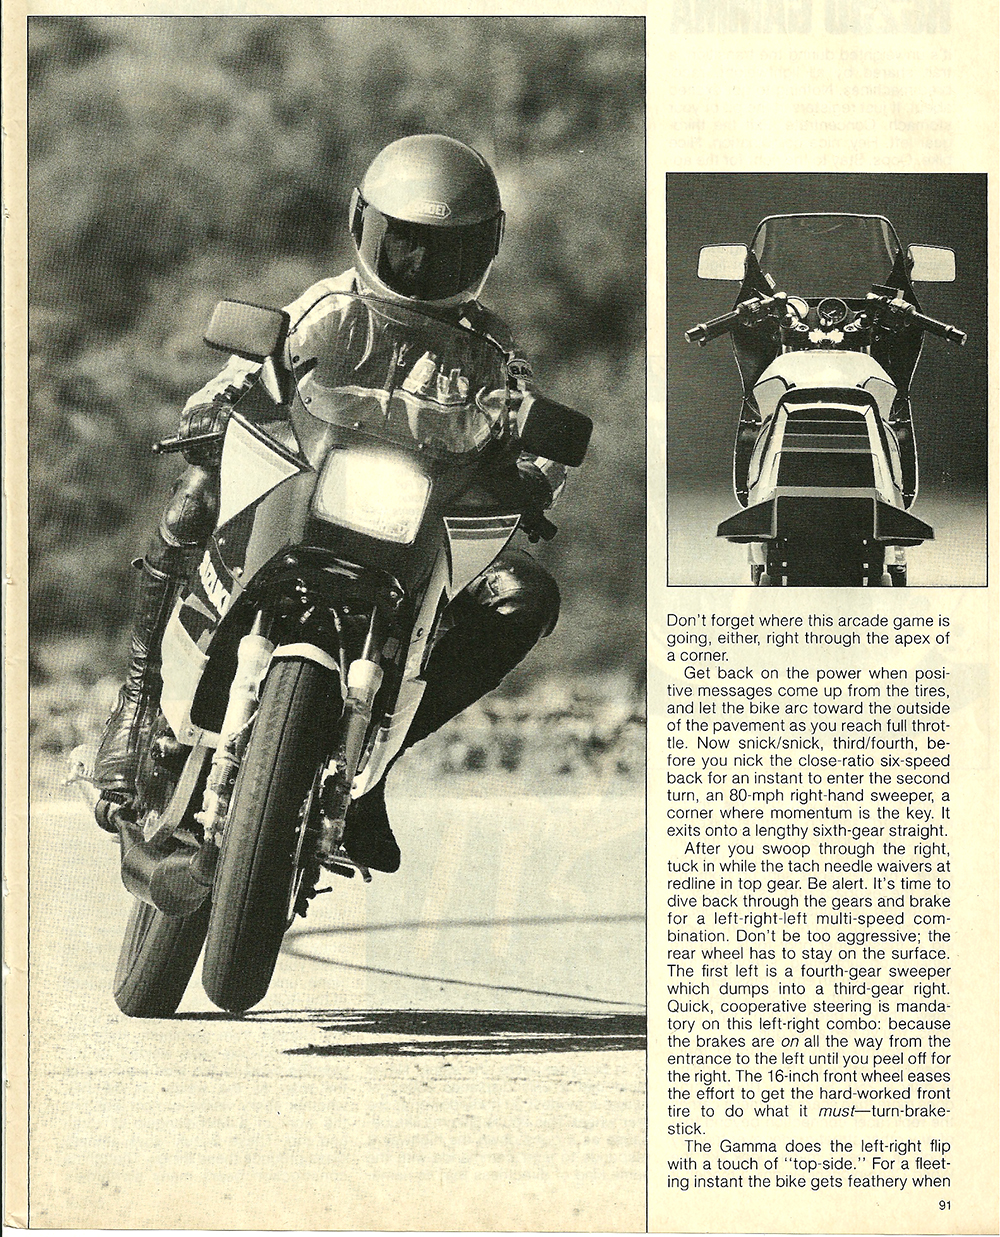 1984 Suzuki RG250 Gamma road test 4.jpg